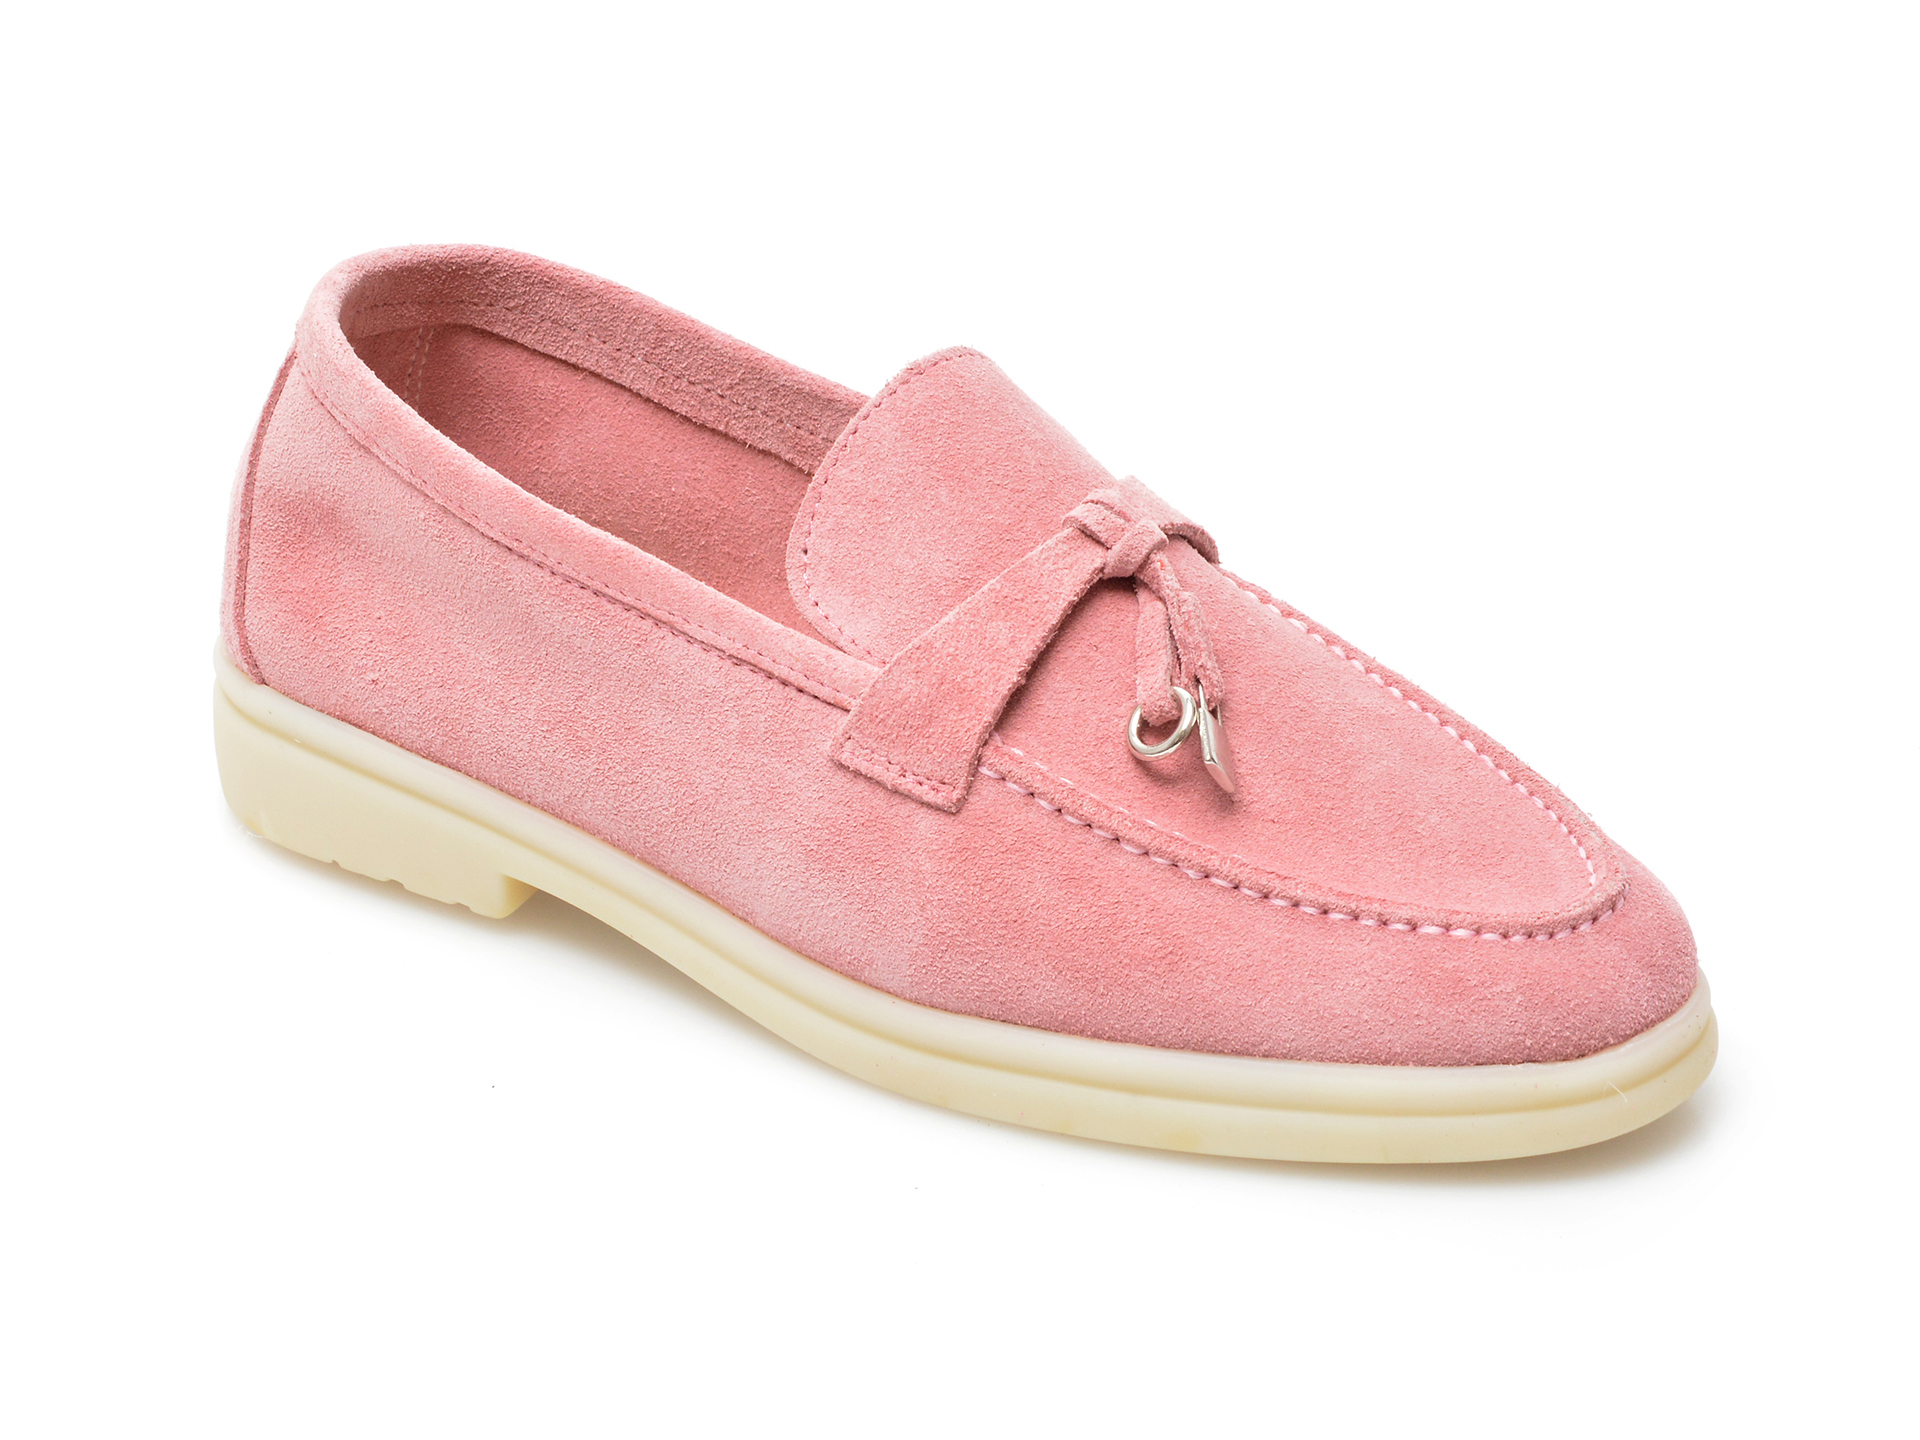 Pantofi IMAGE roz, 205100, din piele intoarsa imagine otter.ro 2021